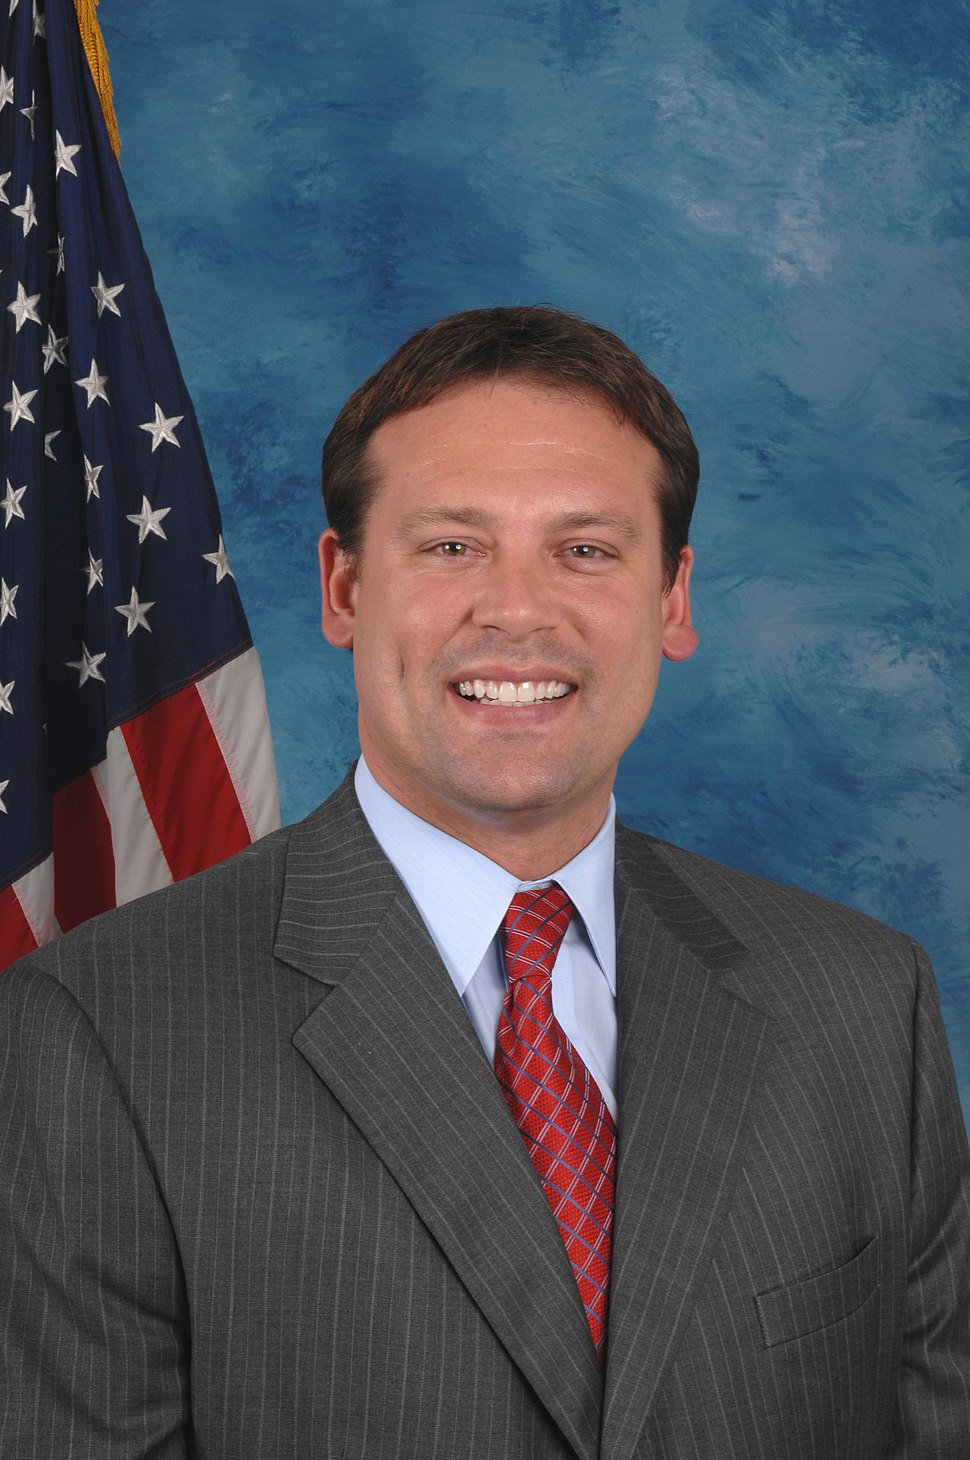 Heath Shuler, official 110th Congressional photo portrait